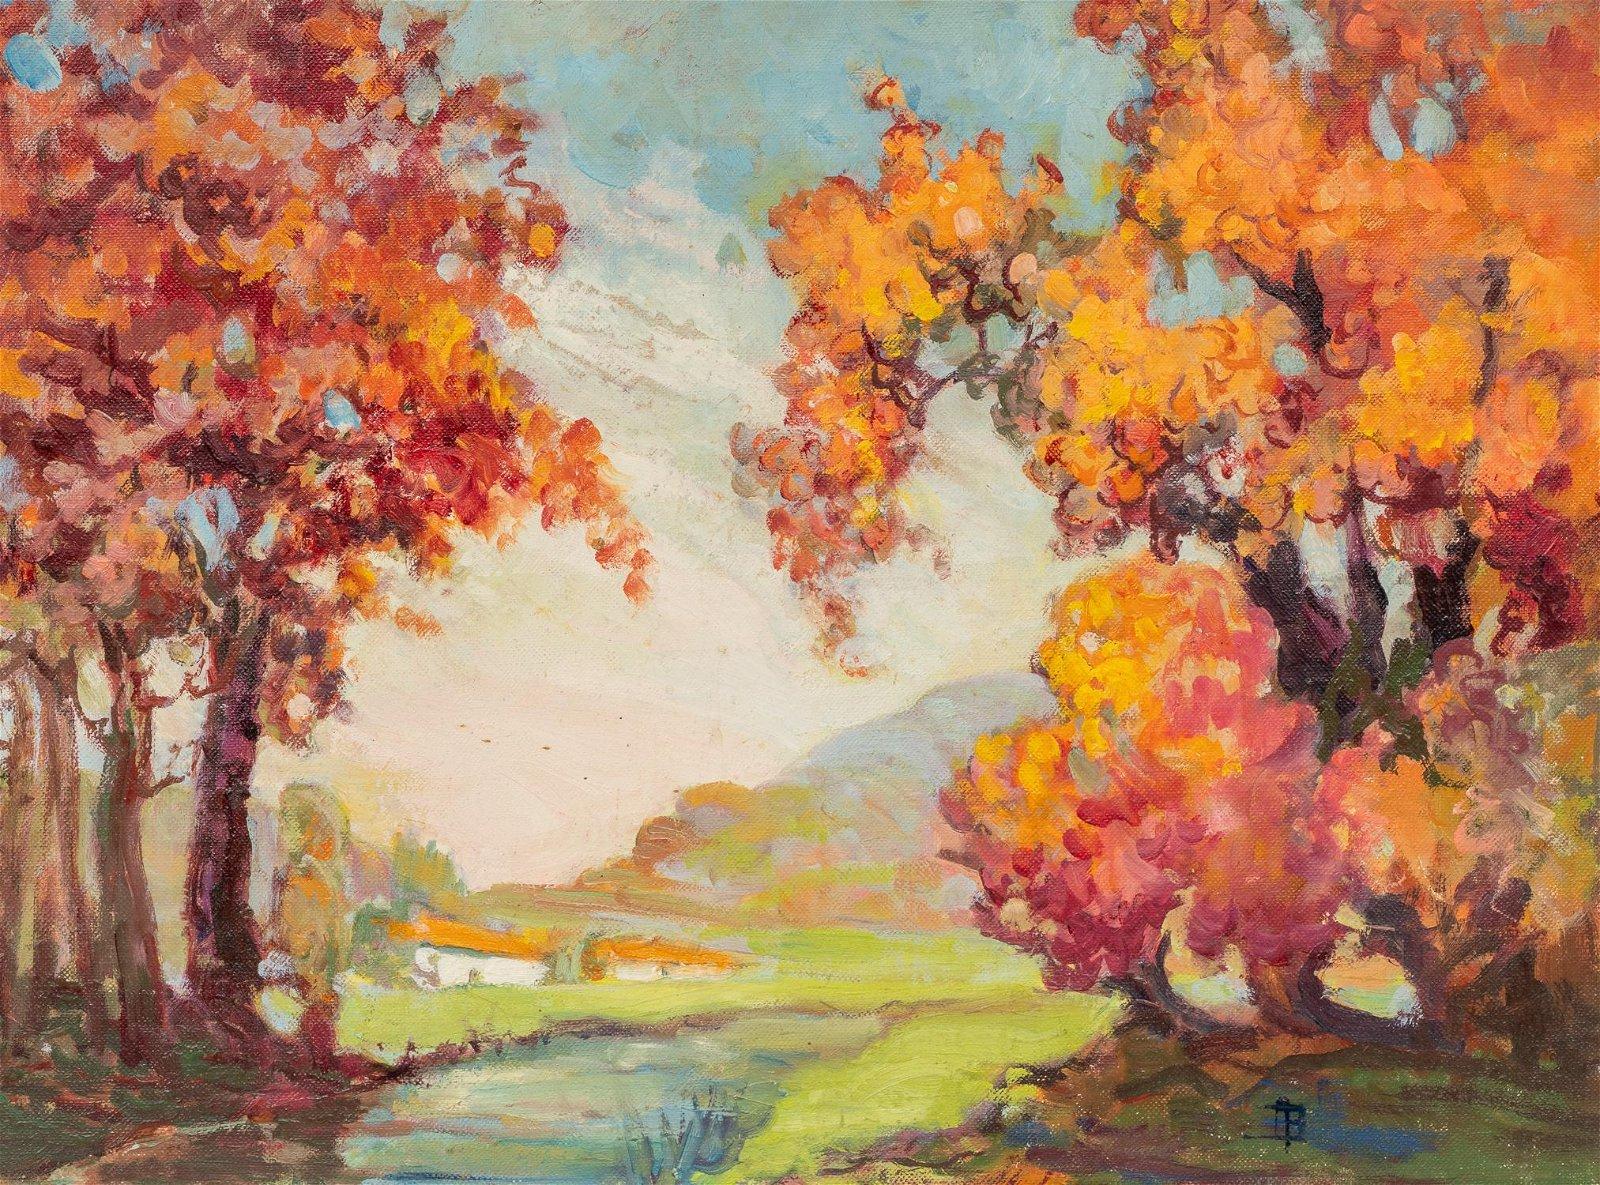 Adele Brunet (1871-1963), Autumn Landscape, oil